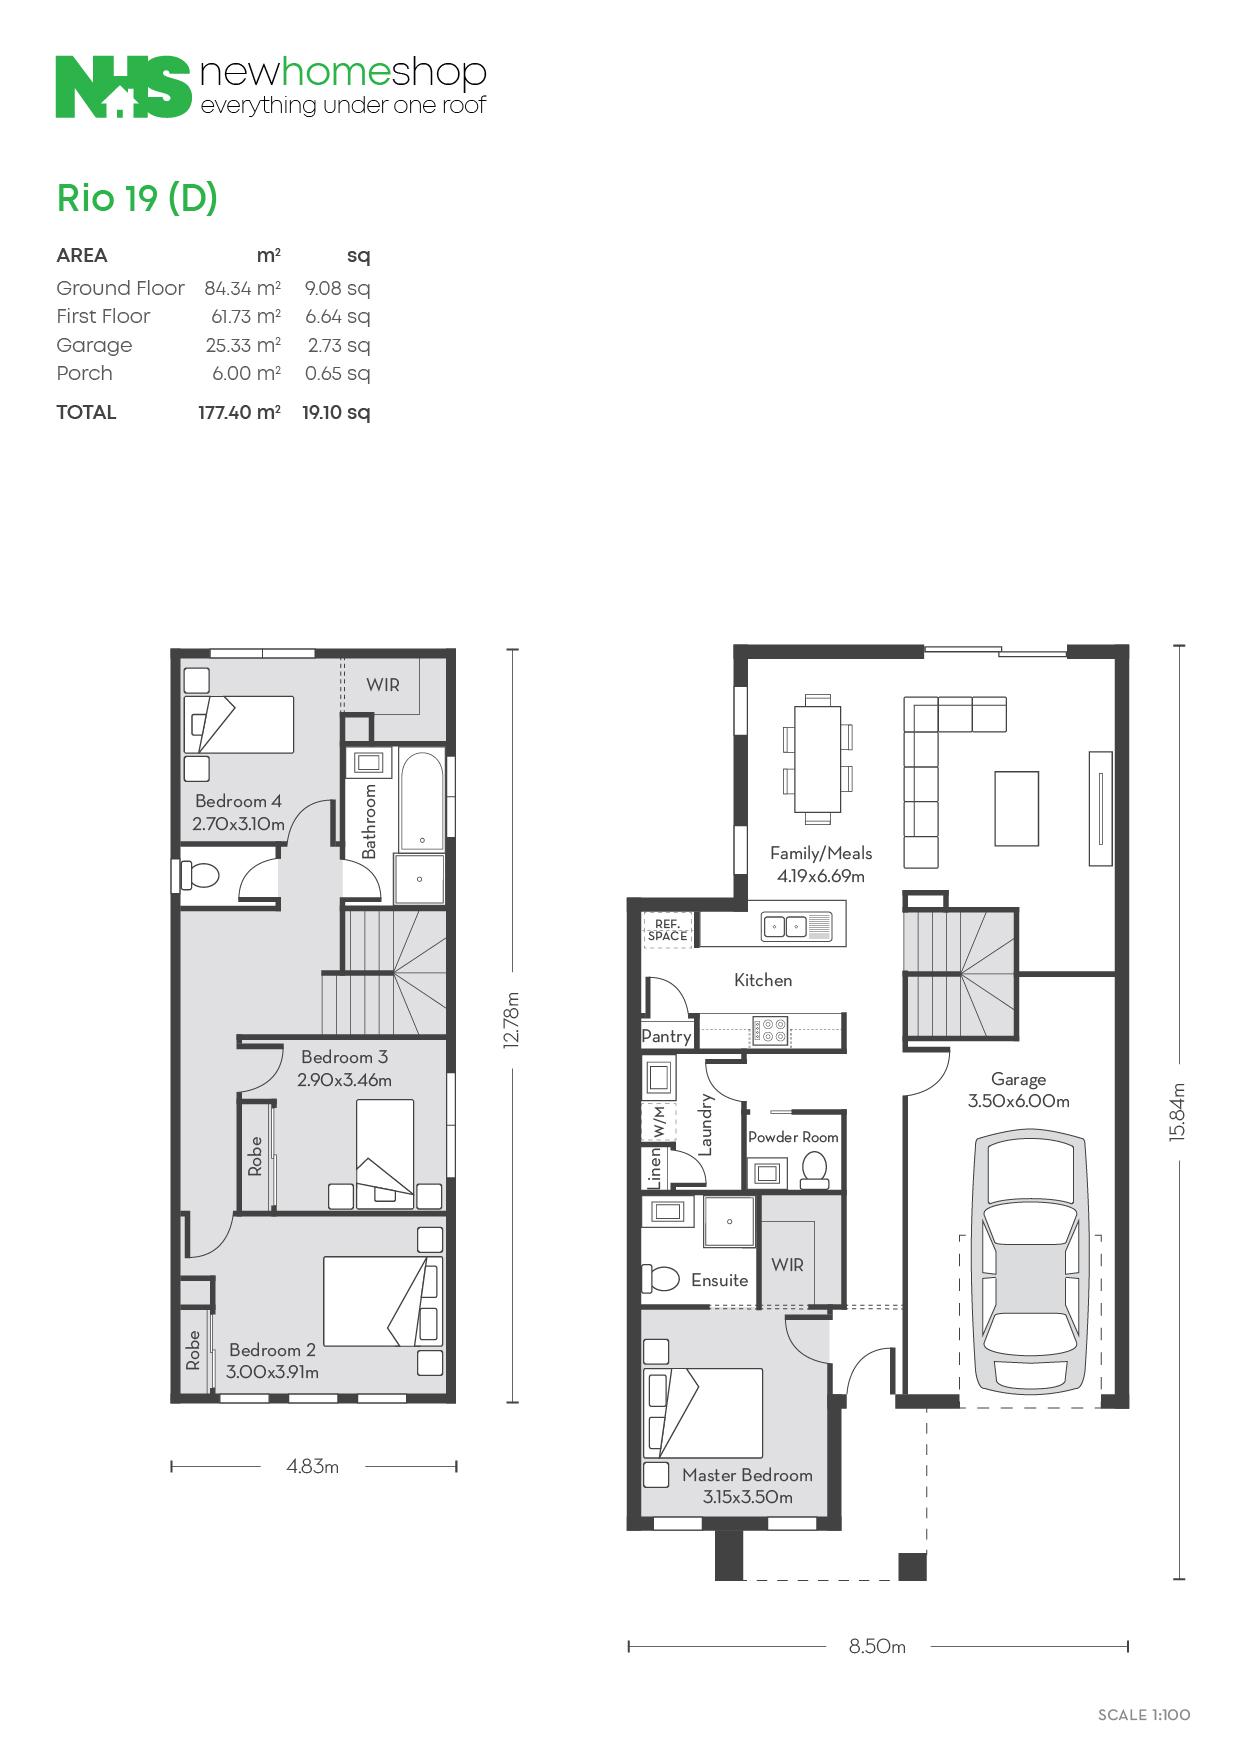 Lot 401, 402 Rejoice Street